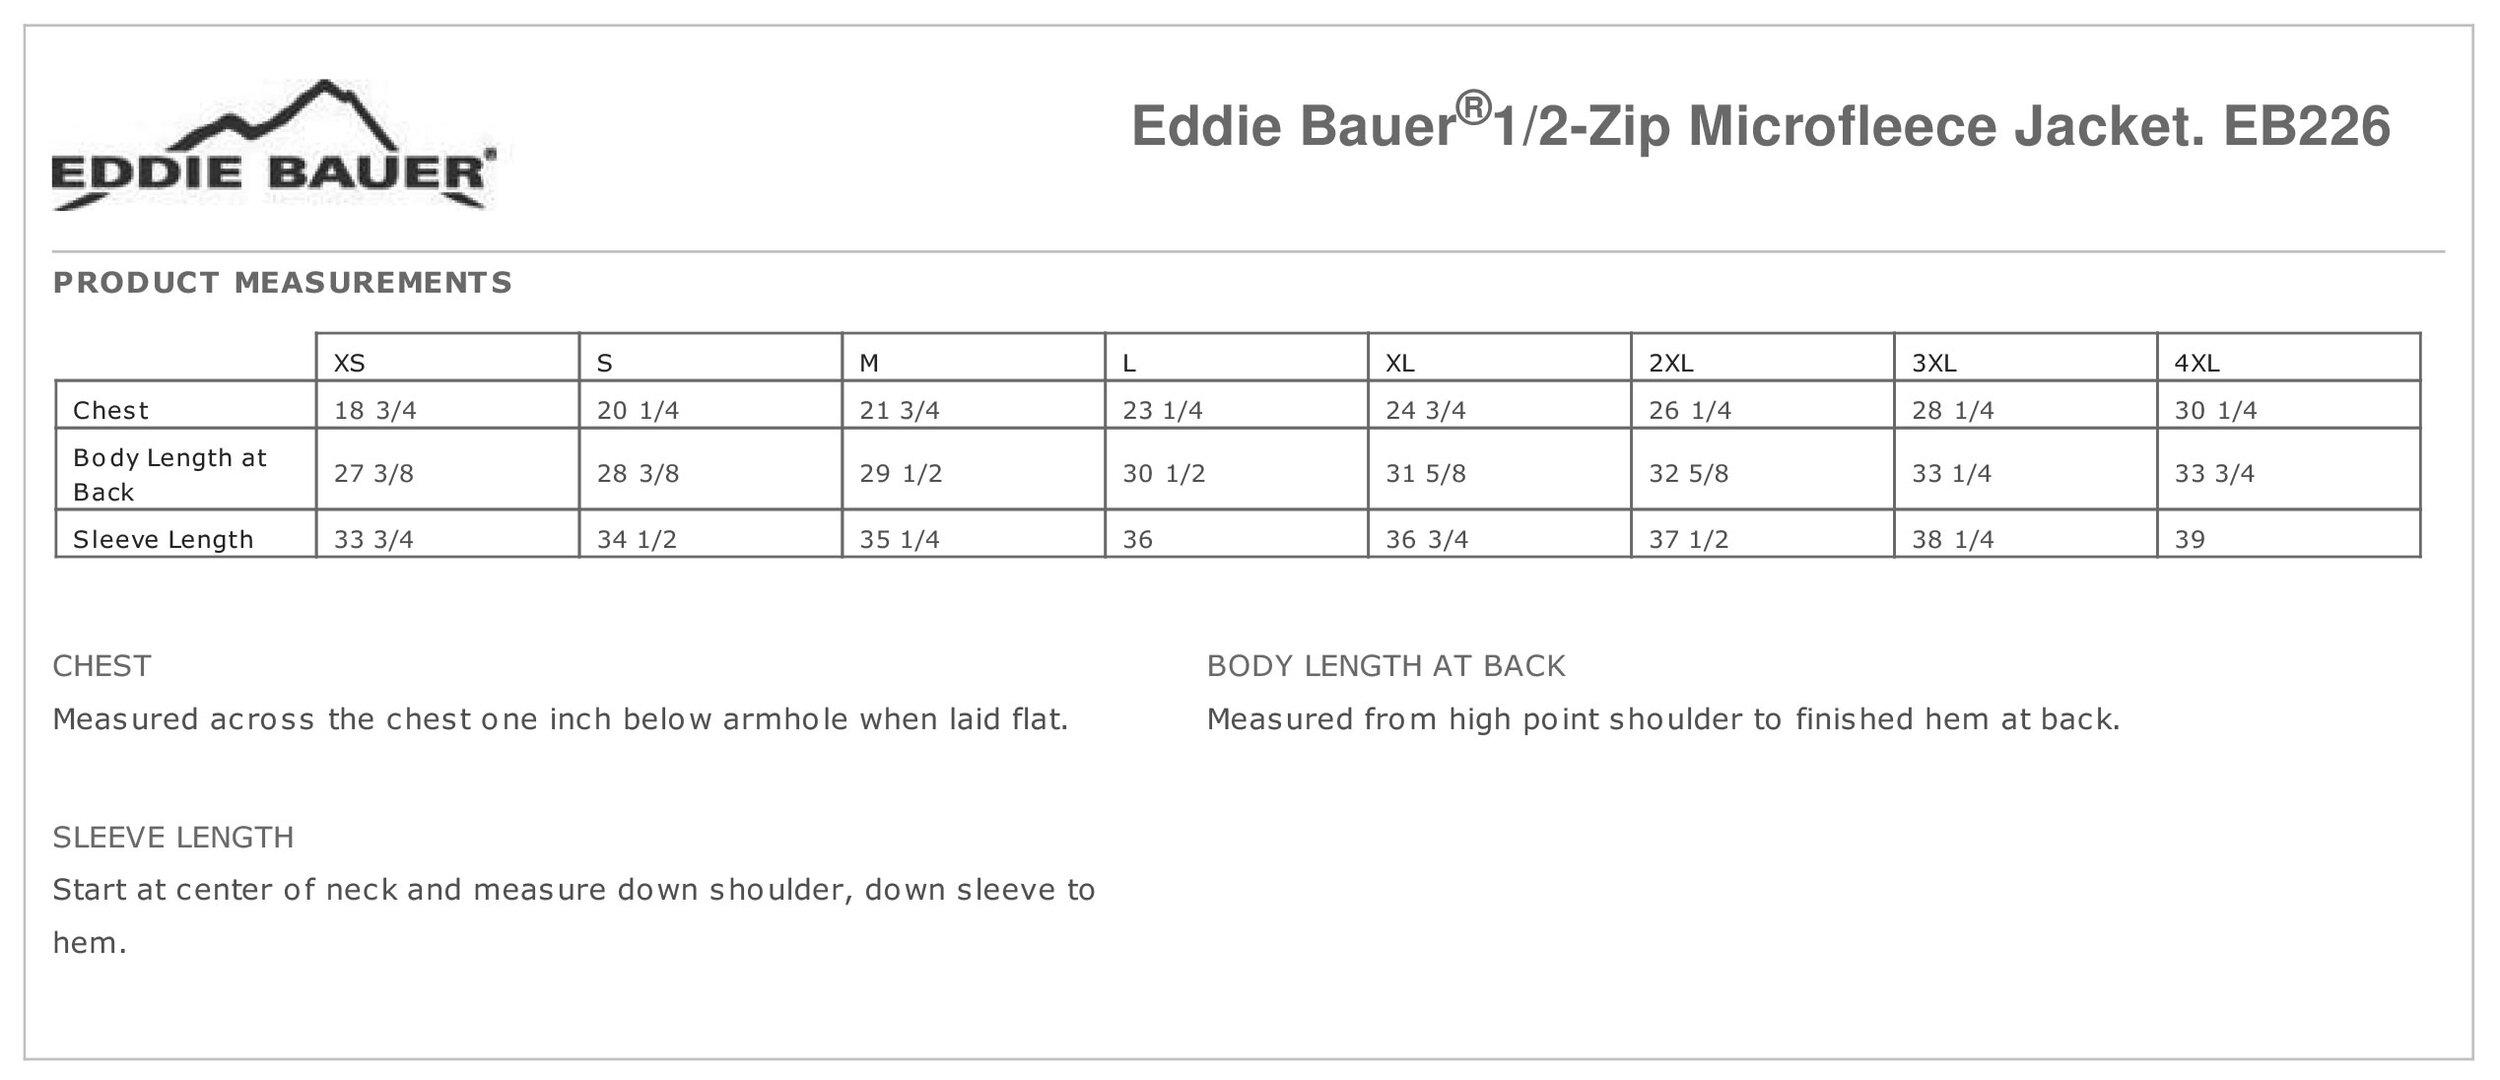 EB226_productmeasurement.jpg